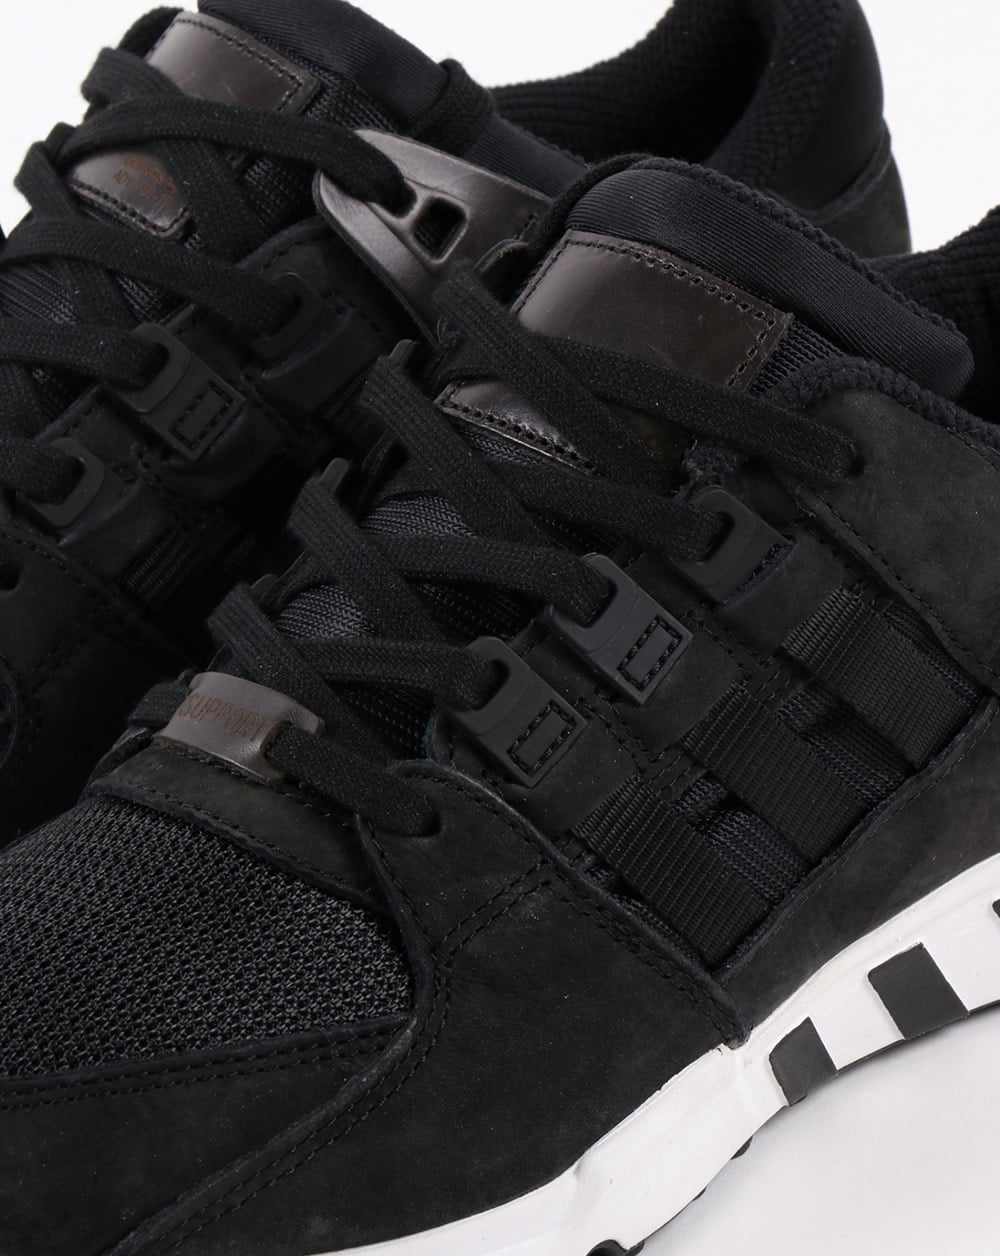 the latest 42eda 5f390 Adidas EQT Support RF Trainers Black/Black